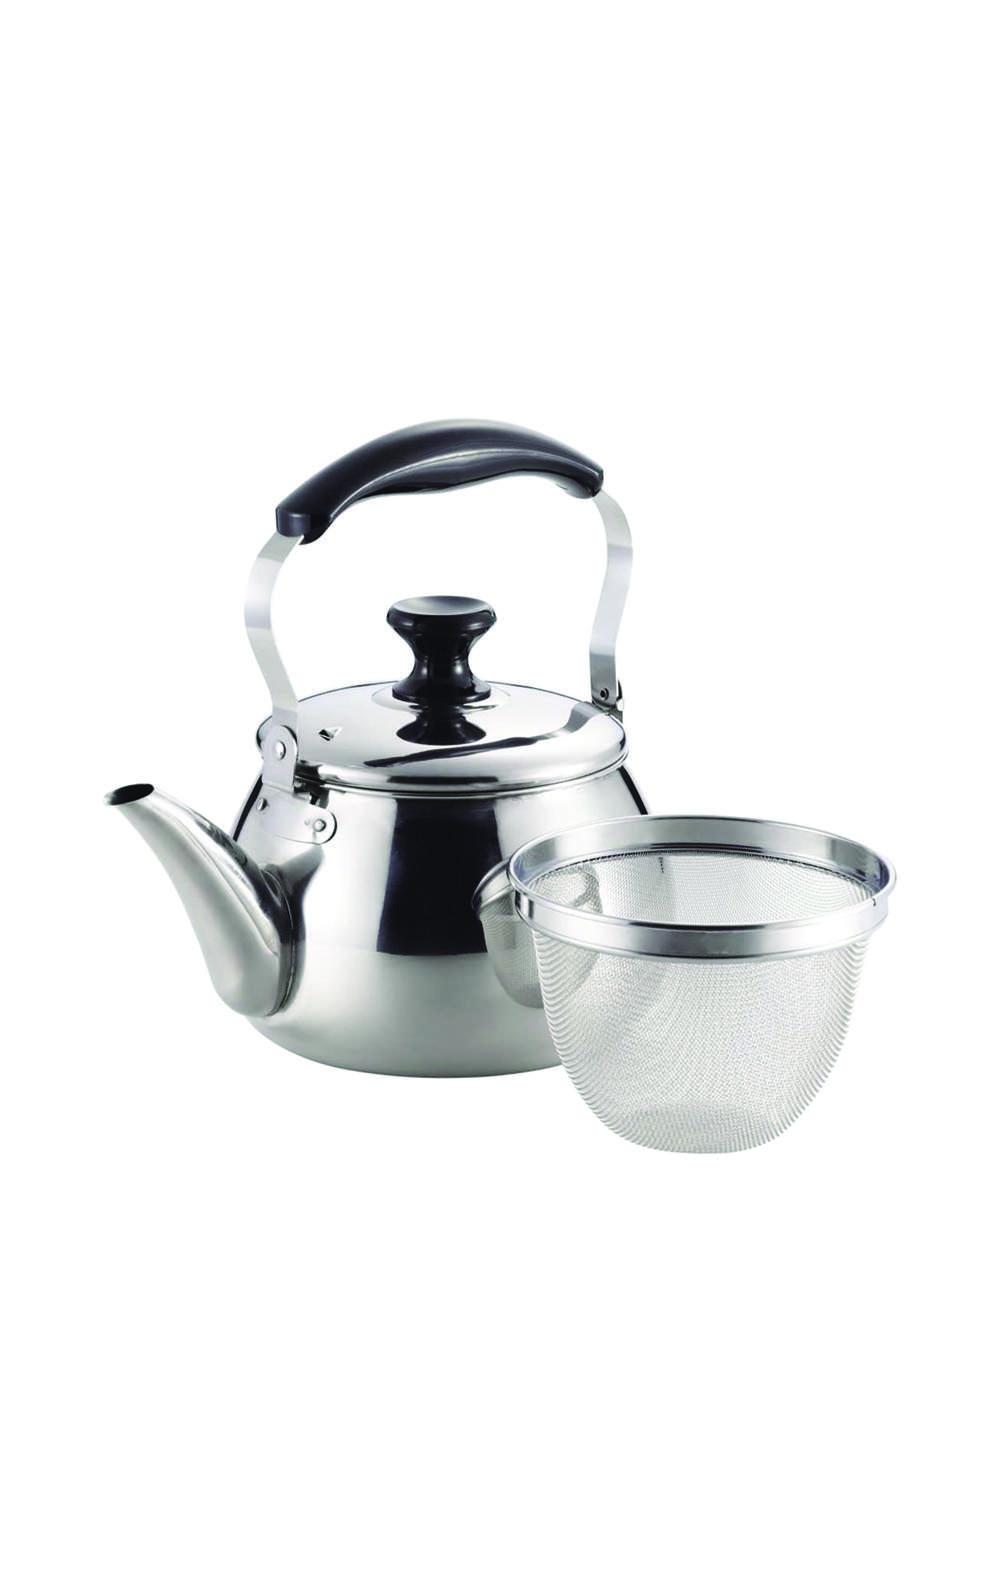 Pearl Metal HB-7125 Oruti 18-8 stainless steel kettle 3 L ابريق